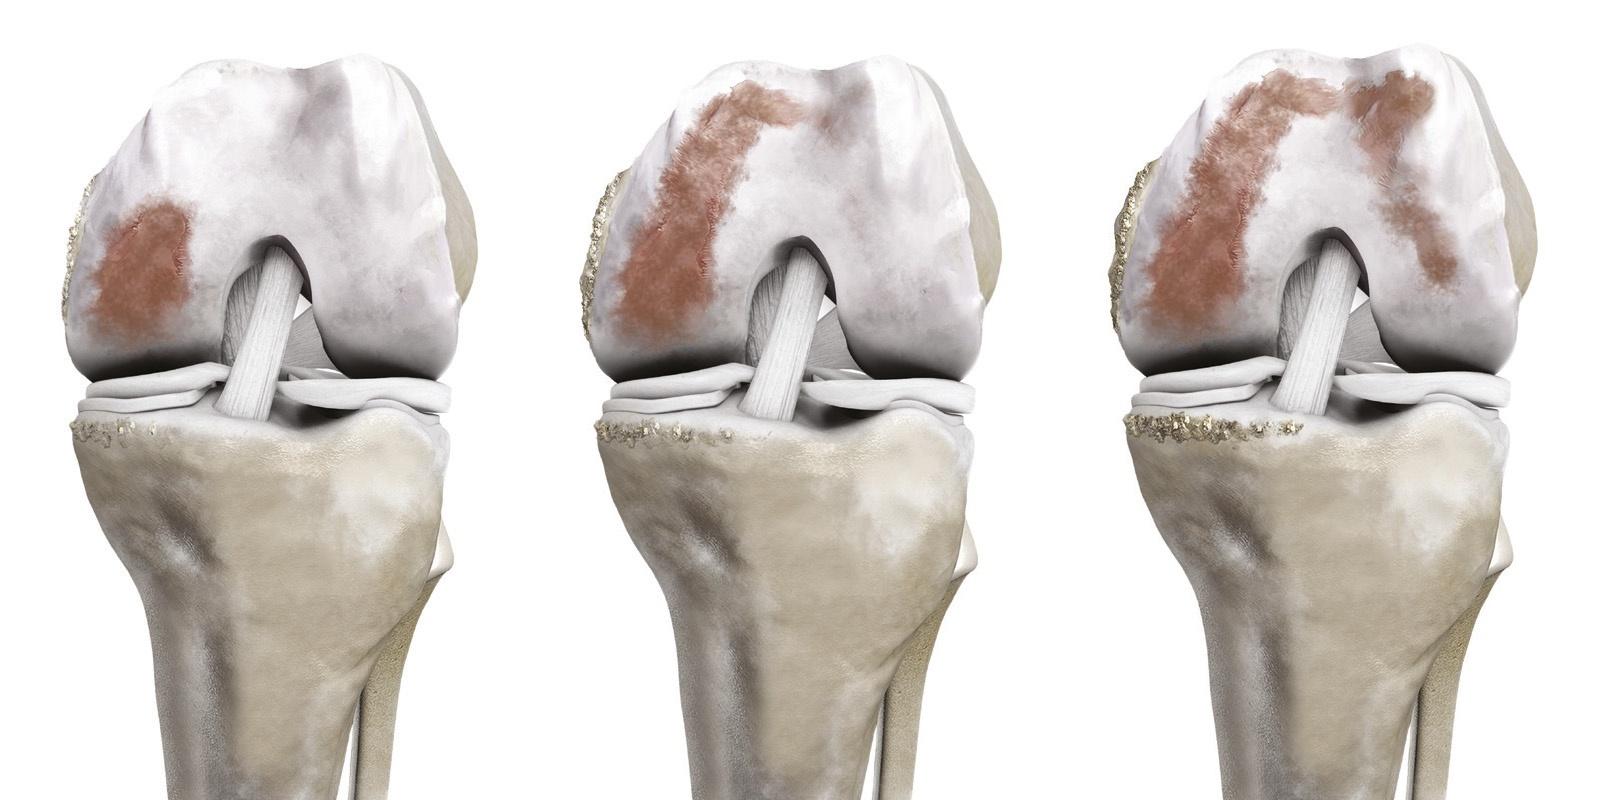 Kniearthrose in 1, 2 oder 3 Kompartimenten